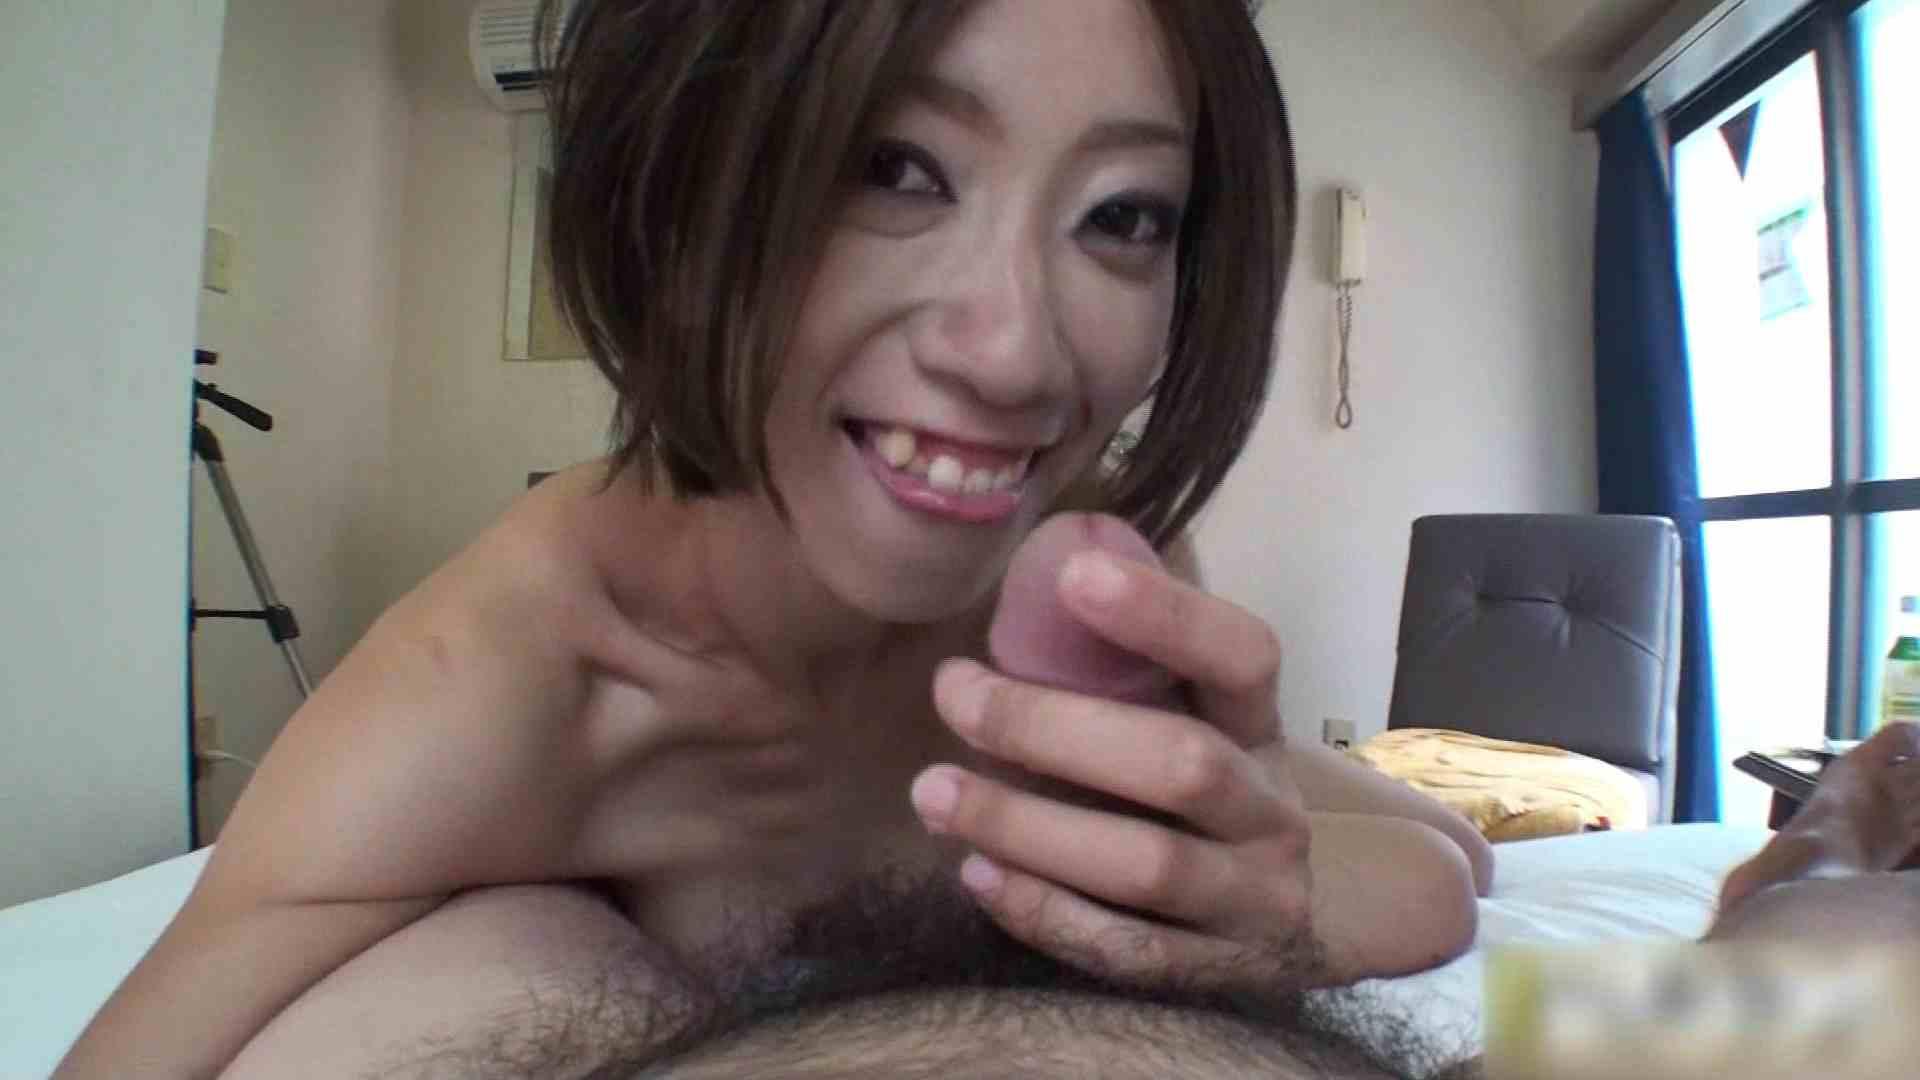 S級厳選美女ビッチガールVol.46 美しいOLの裸体 セックス無修正動画無料 89pic 37